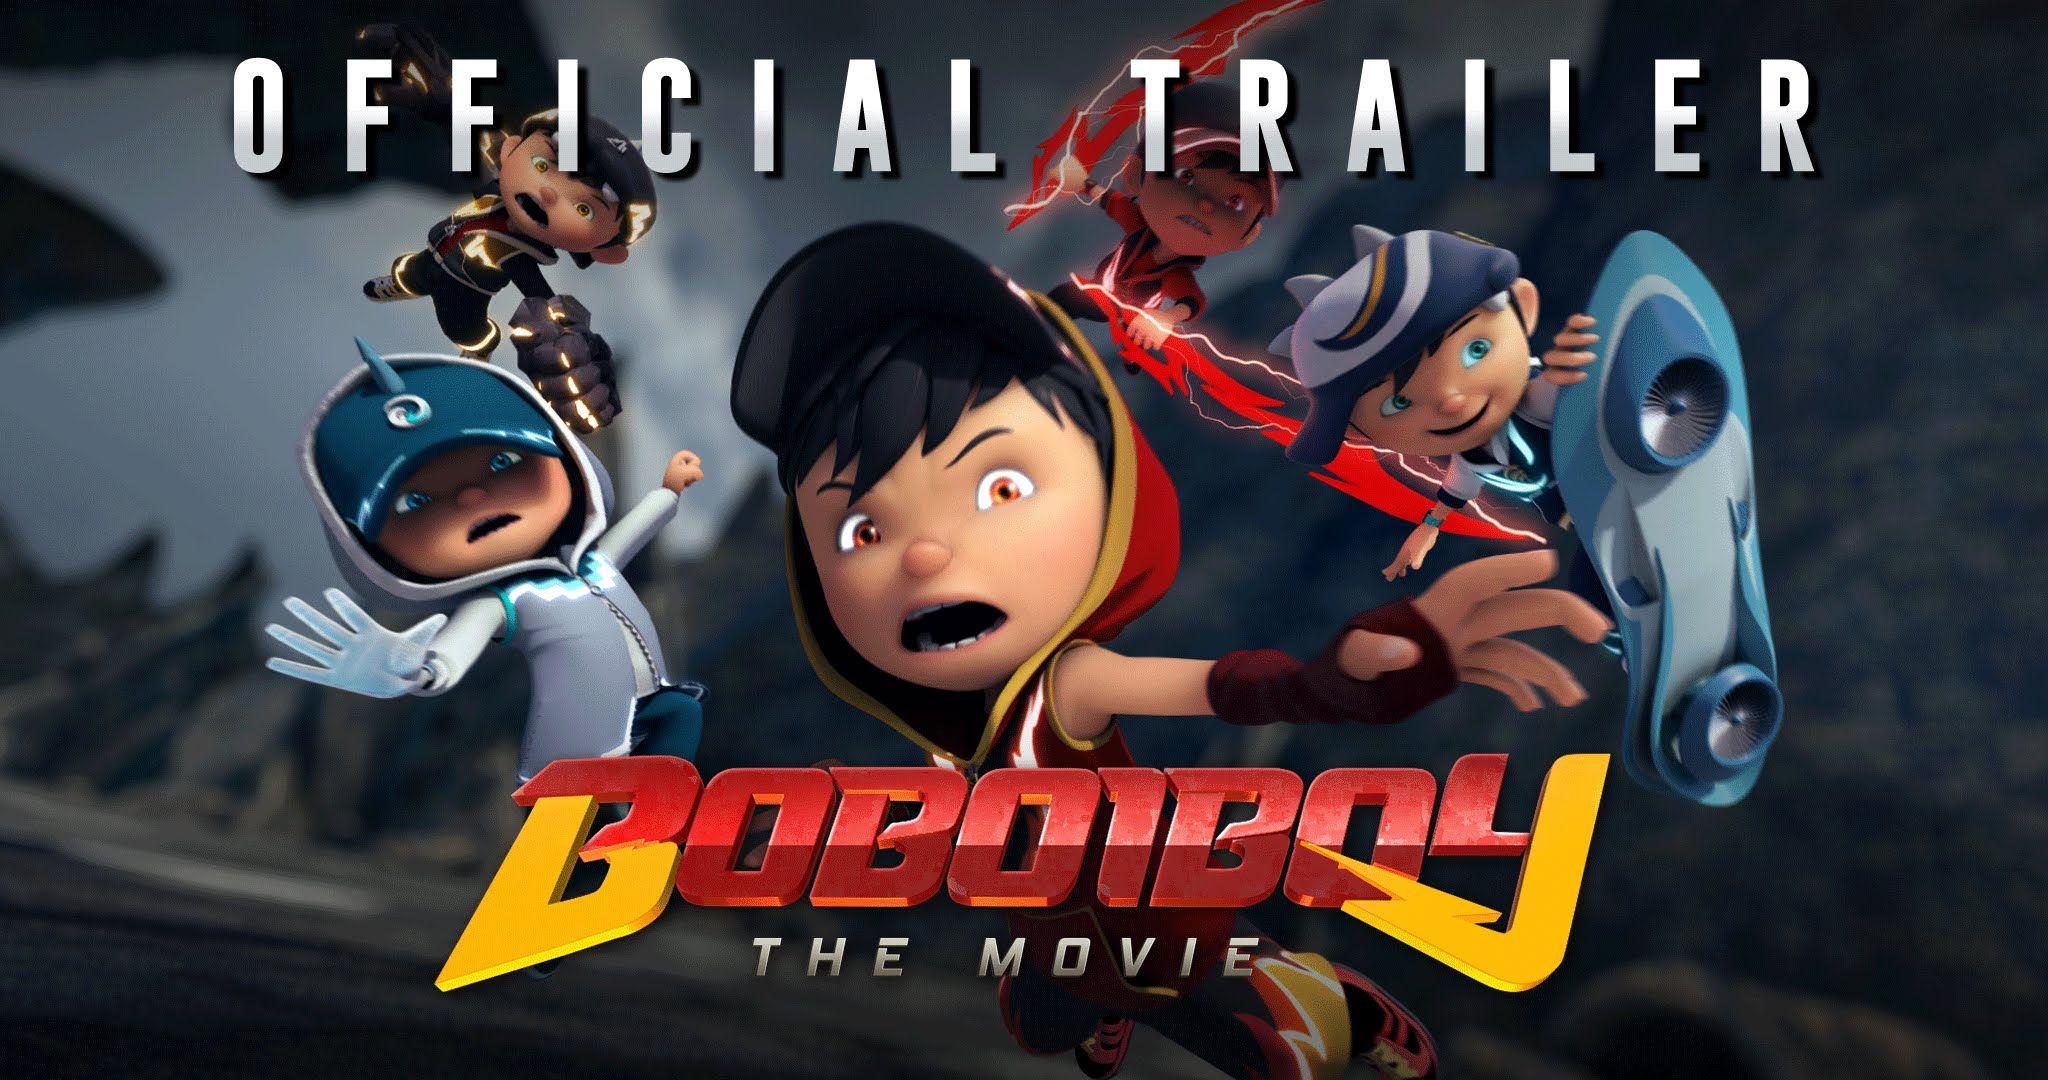 Boboiboy The Movie Trailer 1 3 Mac Malaysia 13 April